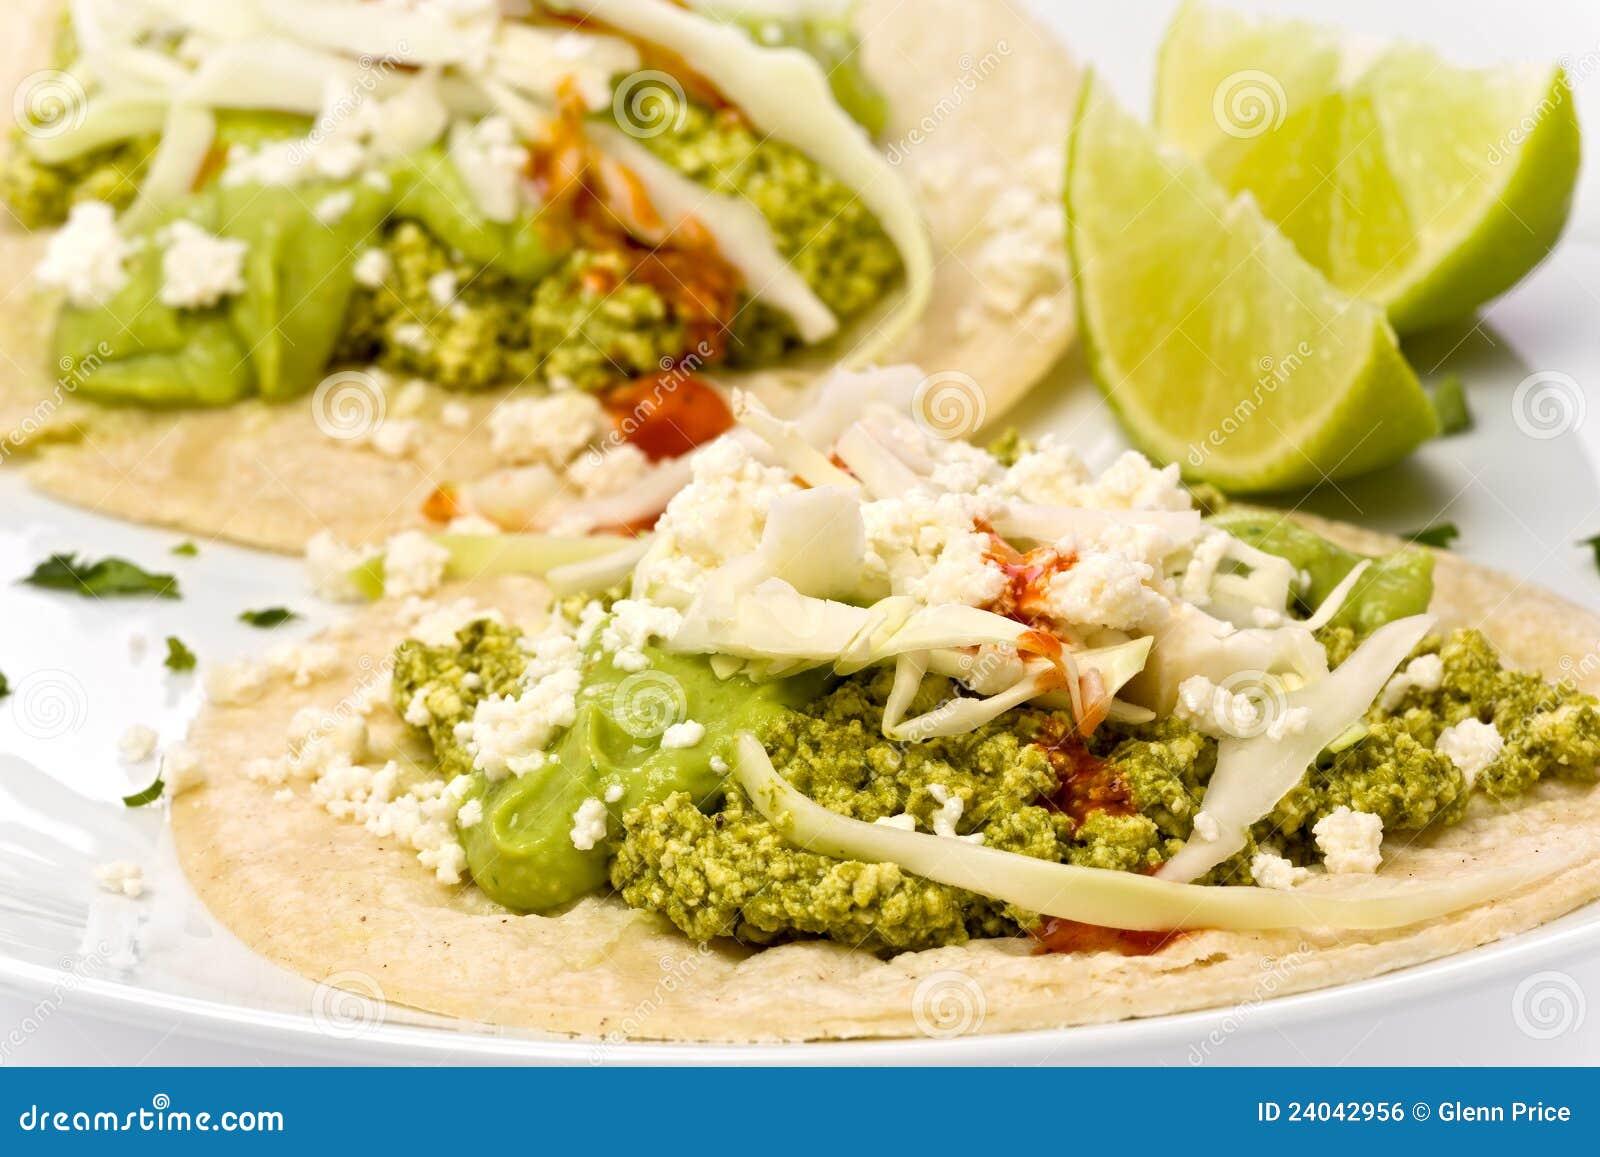 Vegetarian Green Chorizo Tacos Royalty Free Stock Image - Image ...